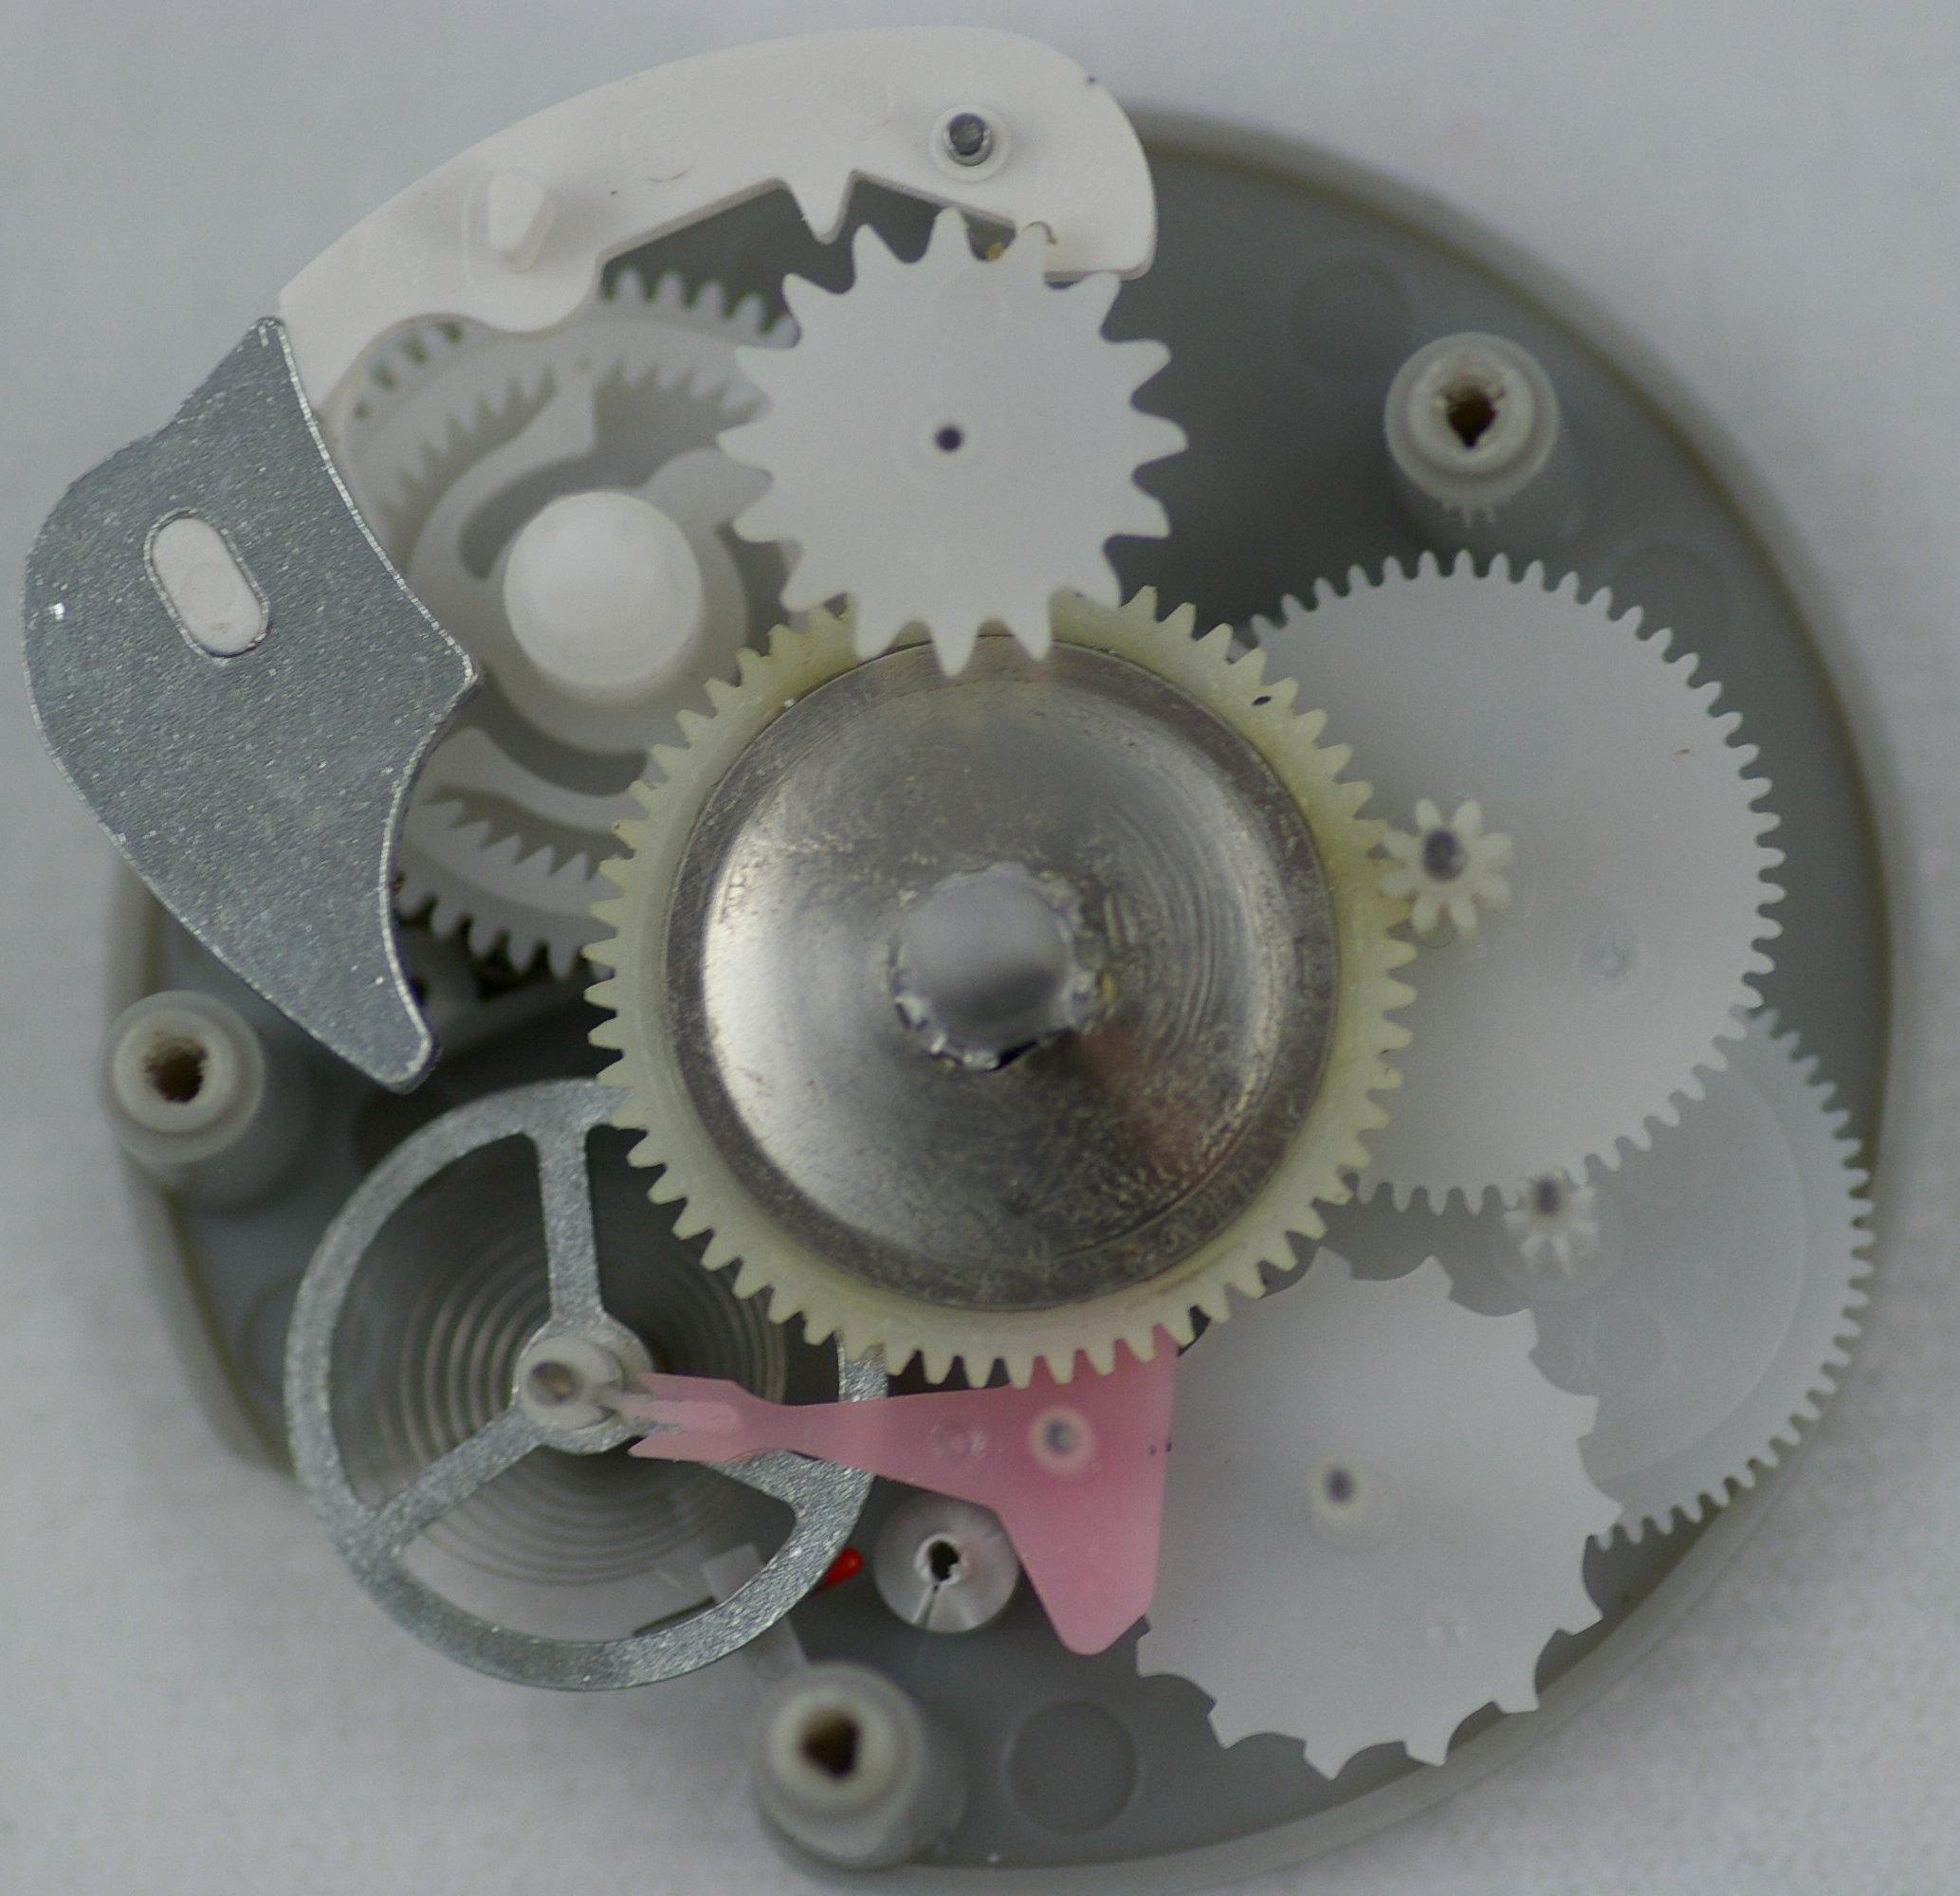 Exceptionnel File:Mechanical Egg Timer Internals